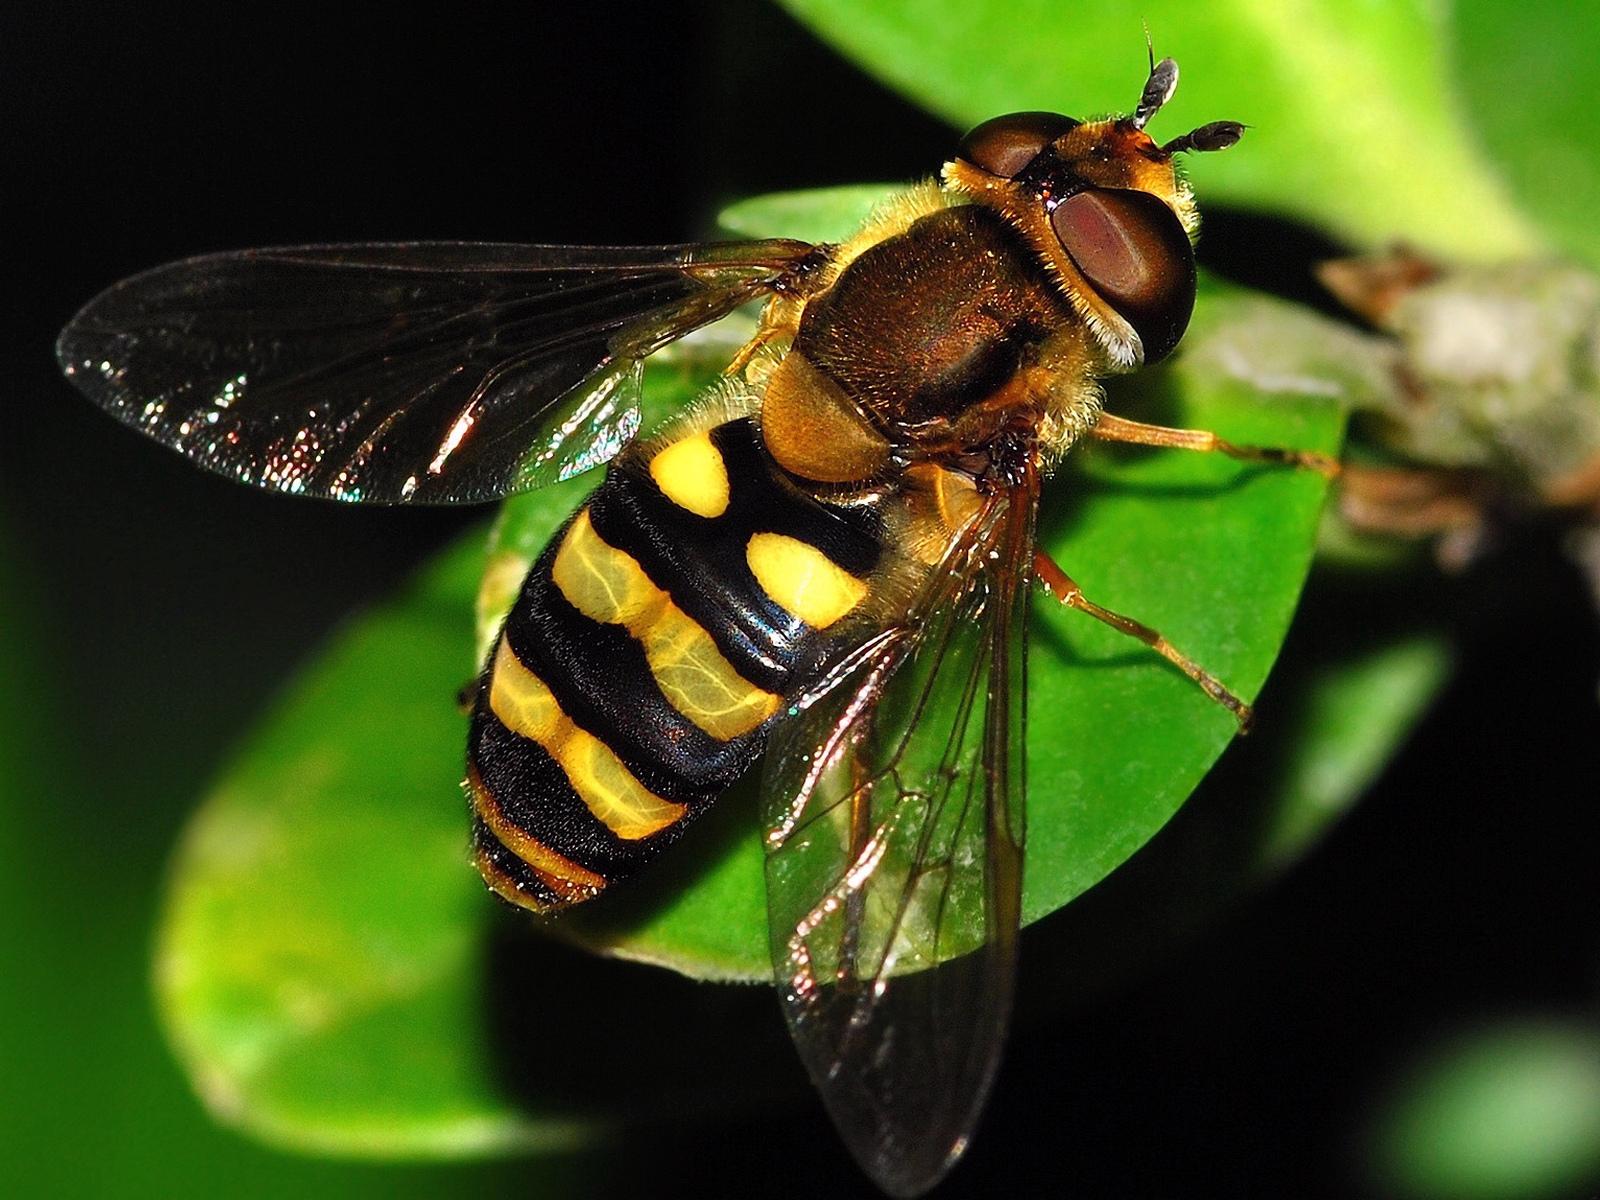 Картинка с насекомыми, картинки приколы